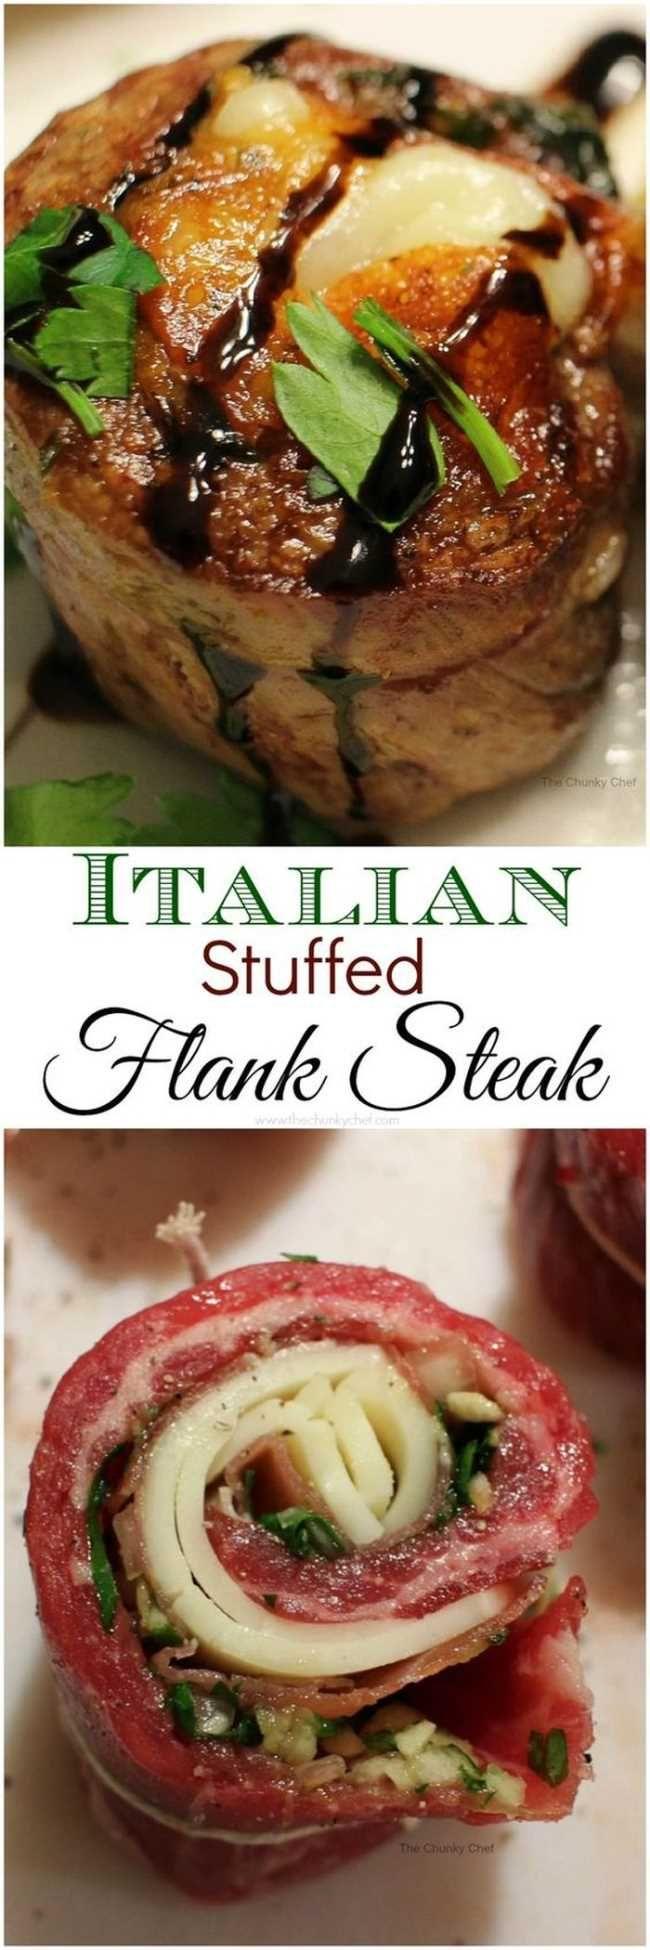 Italian Dinner Party Menu Ideas Part - 25: Best 25+ Italian Food Parties Ideas On Pinterest | Italian Recipes, Italian  Food Appetizers And Italian Food Near Me